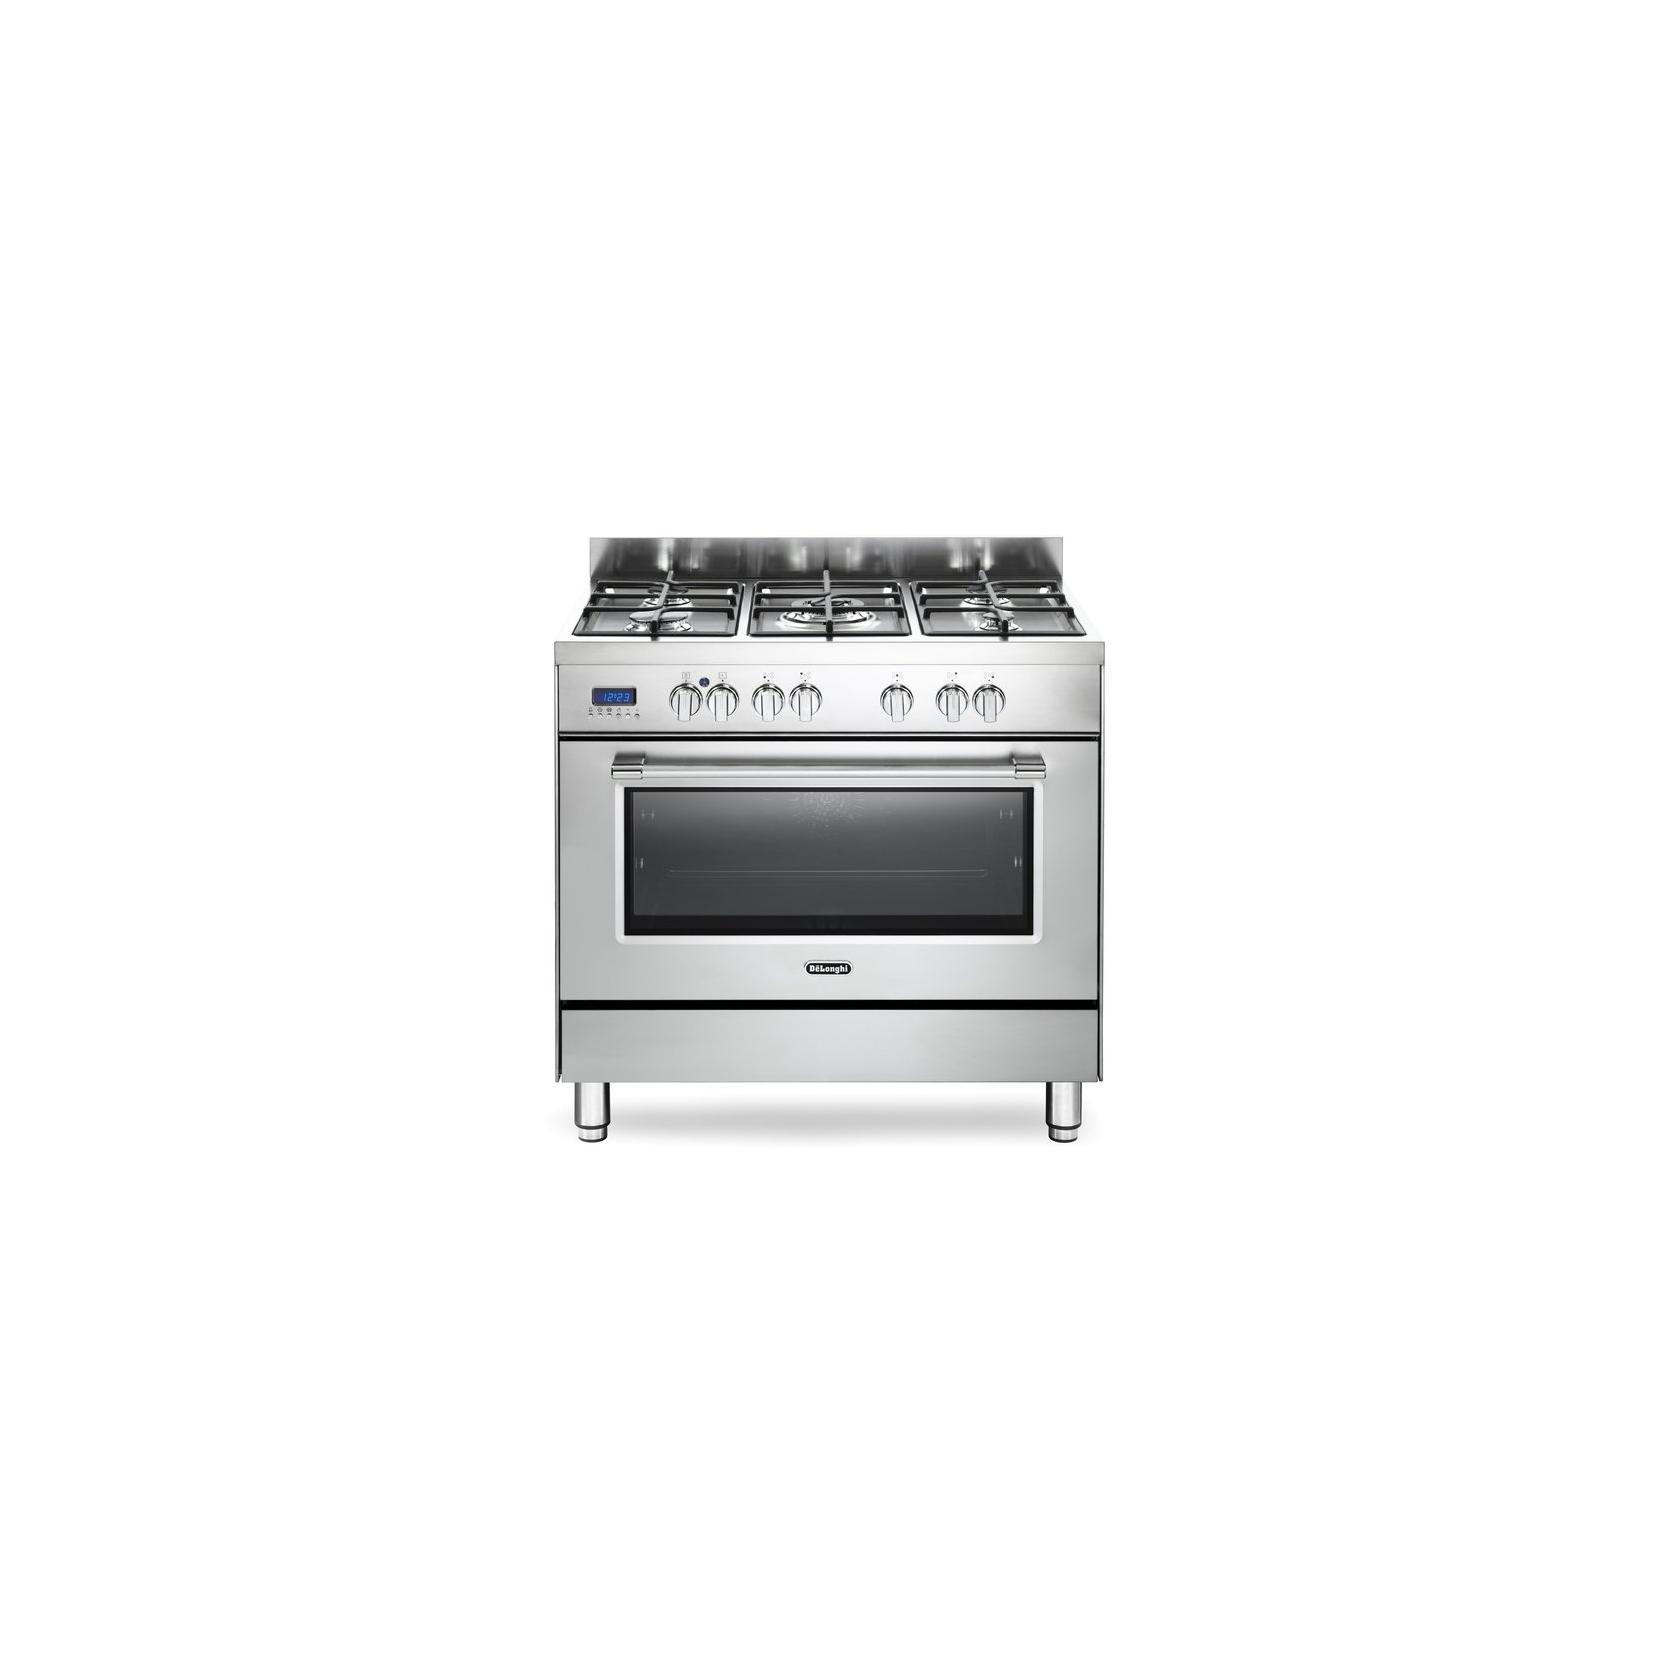 Cucina de longhi pro96mx tuttoforno 90 x 60 inox - De longhi cucine modelli ...